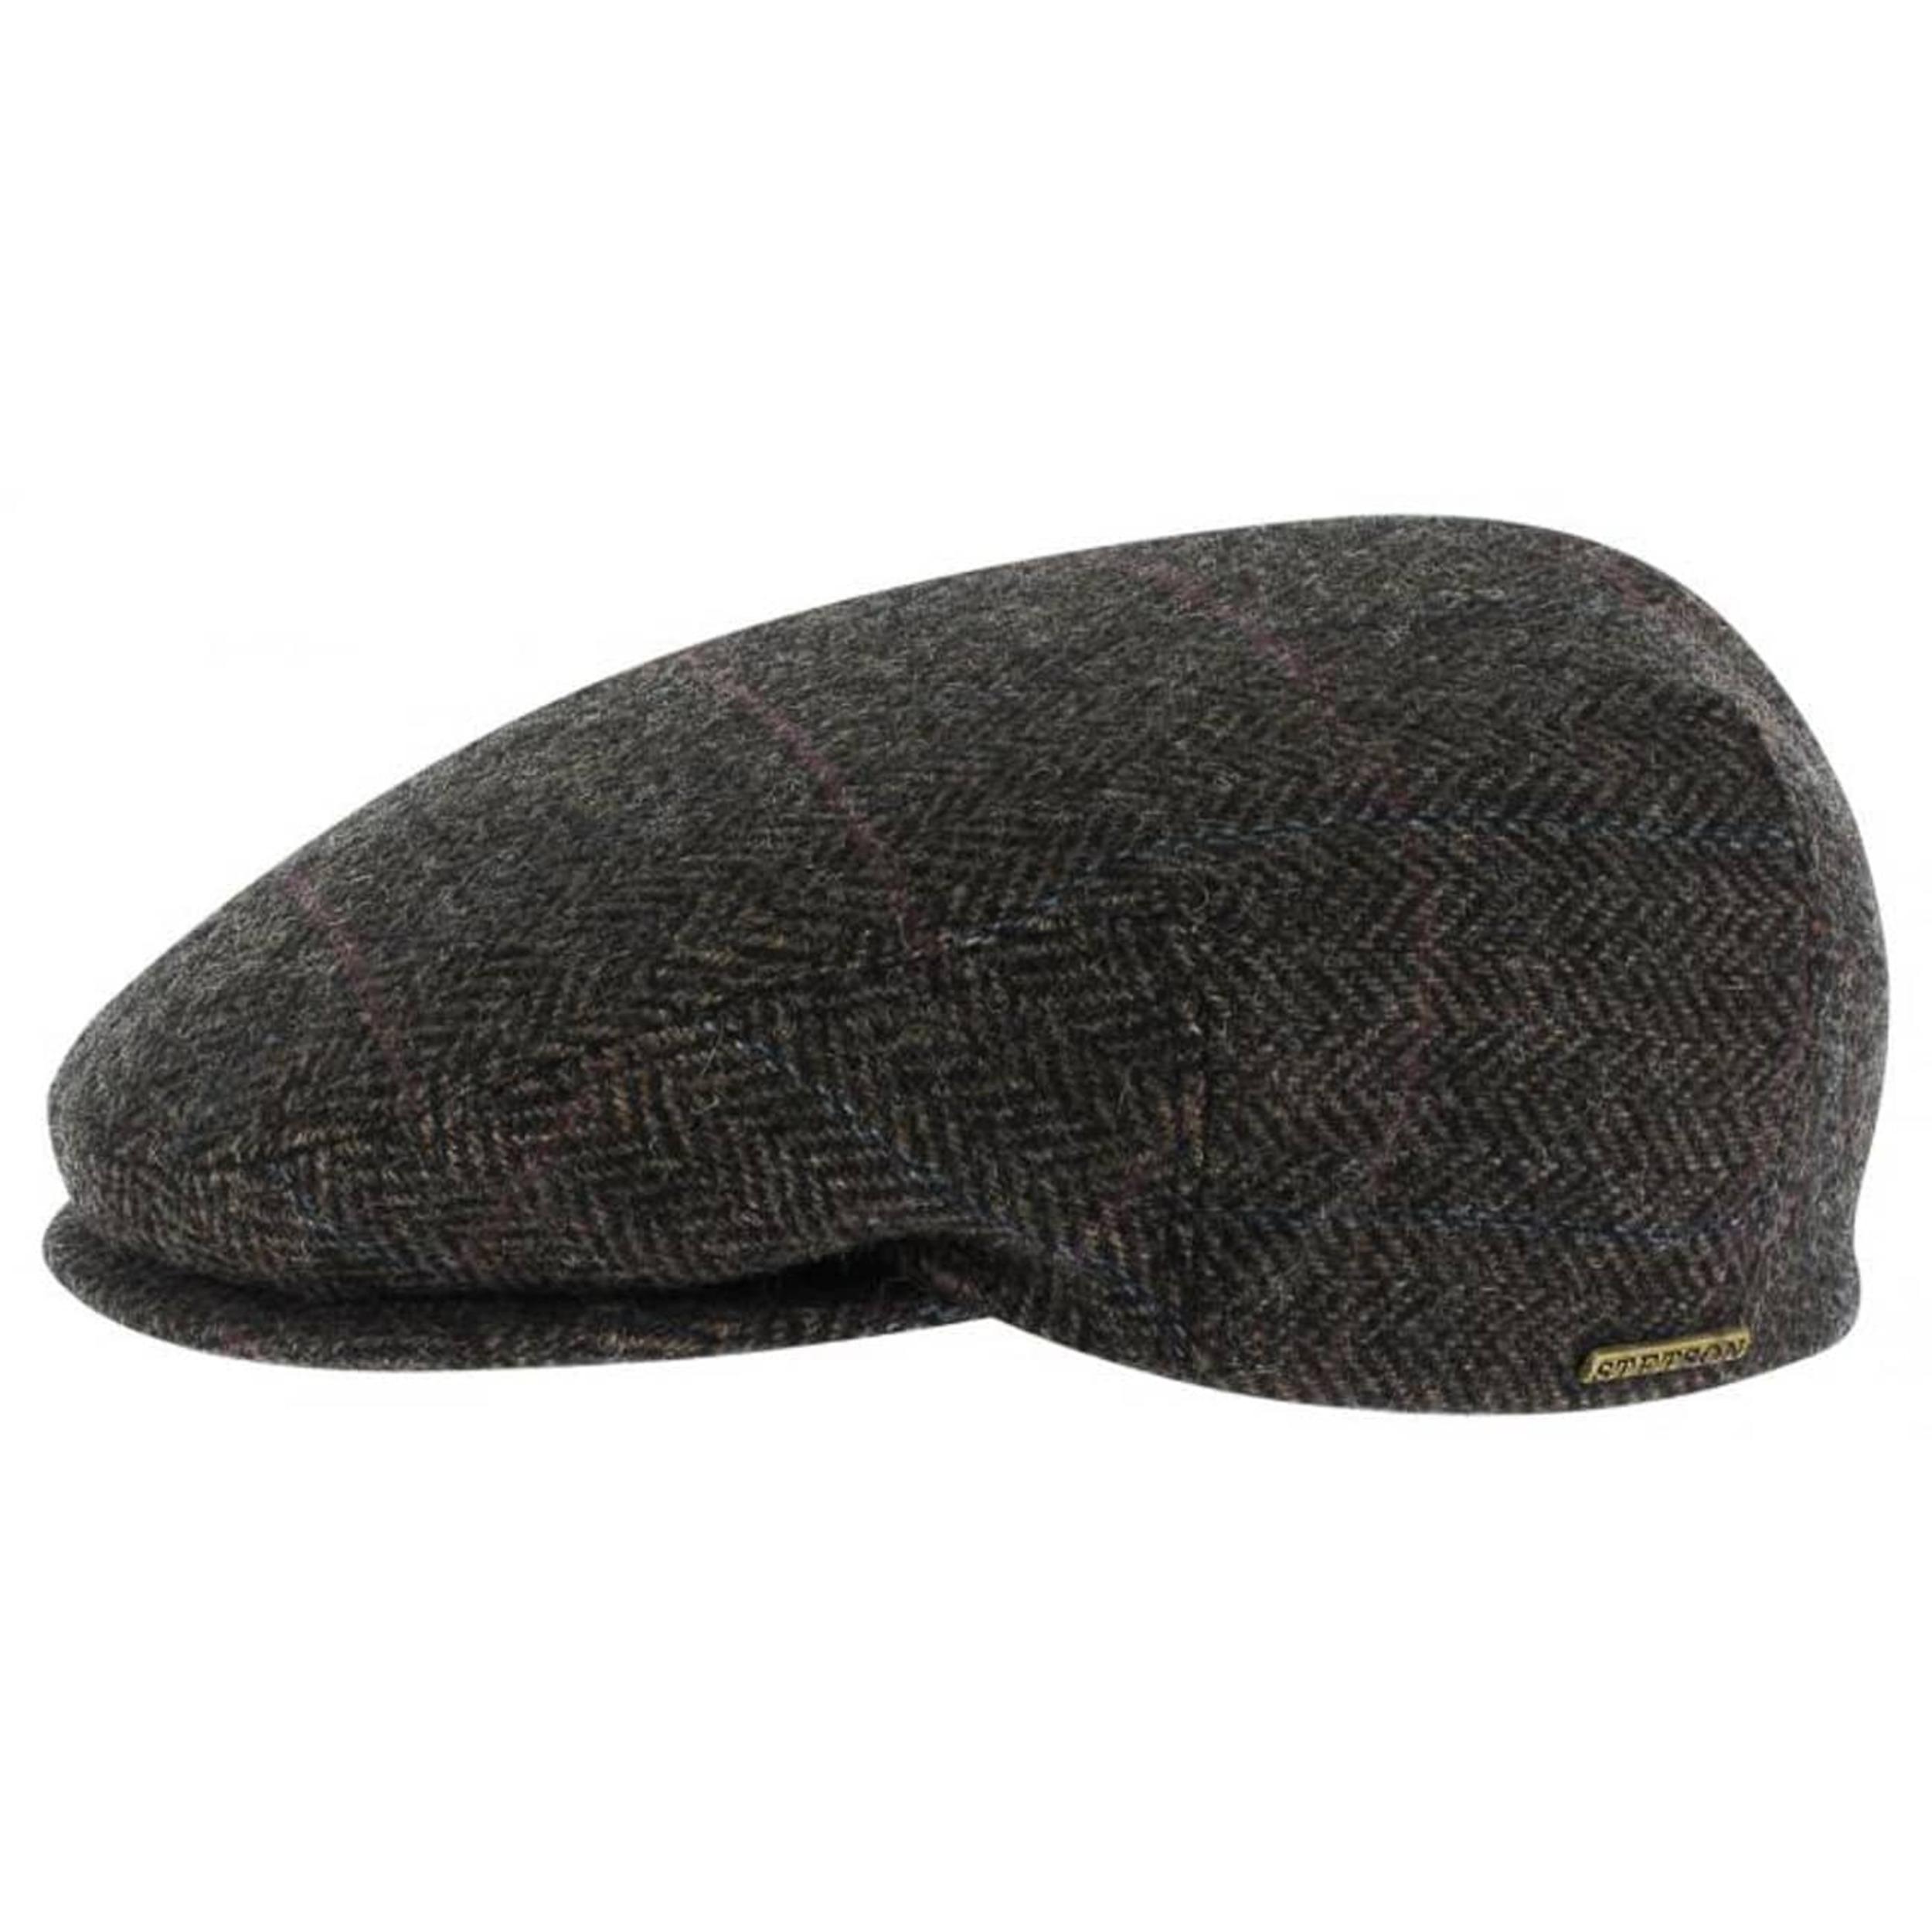 kent earflaps flatcap by stetson 59 00. Black Bedroom Furniture Sets. Home Design Ideas